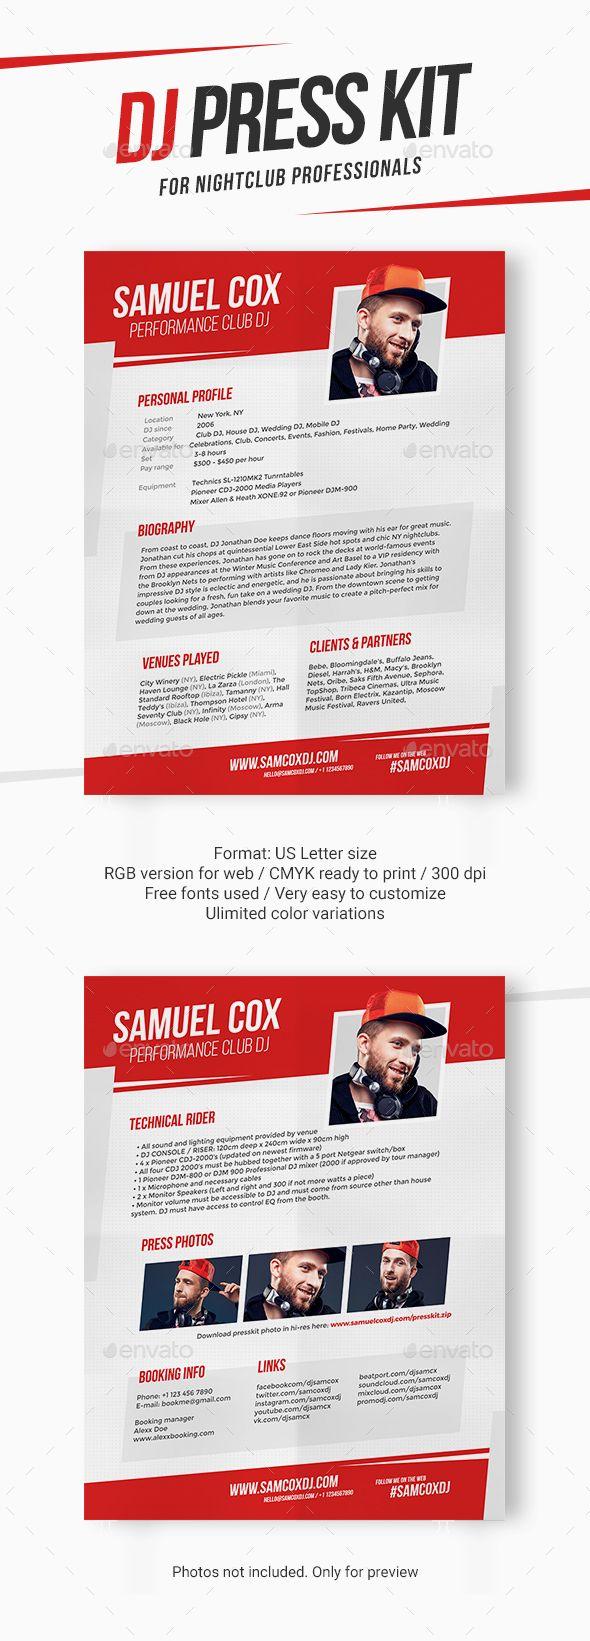 Dj Press Kit Dj Resume Dj Rider Psd Template Professional Mobile Dj Download Https Graphicriver Net Item Dj Press K Press Kit Dj Best Resume Template